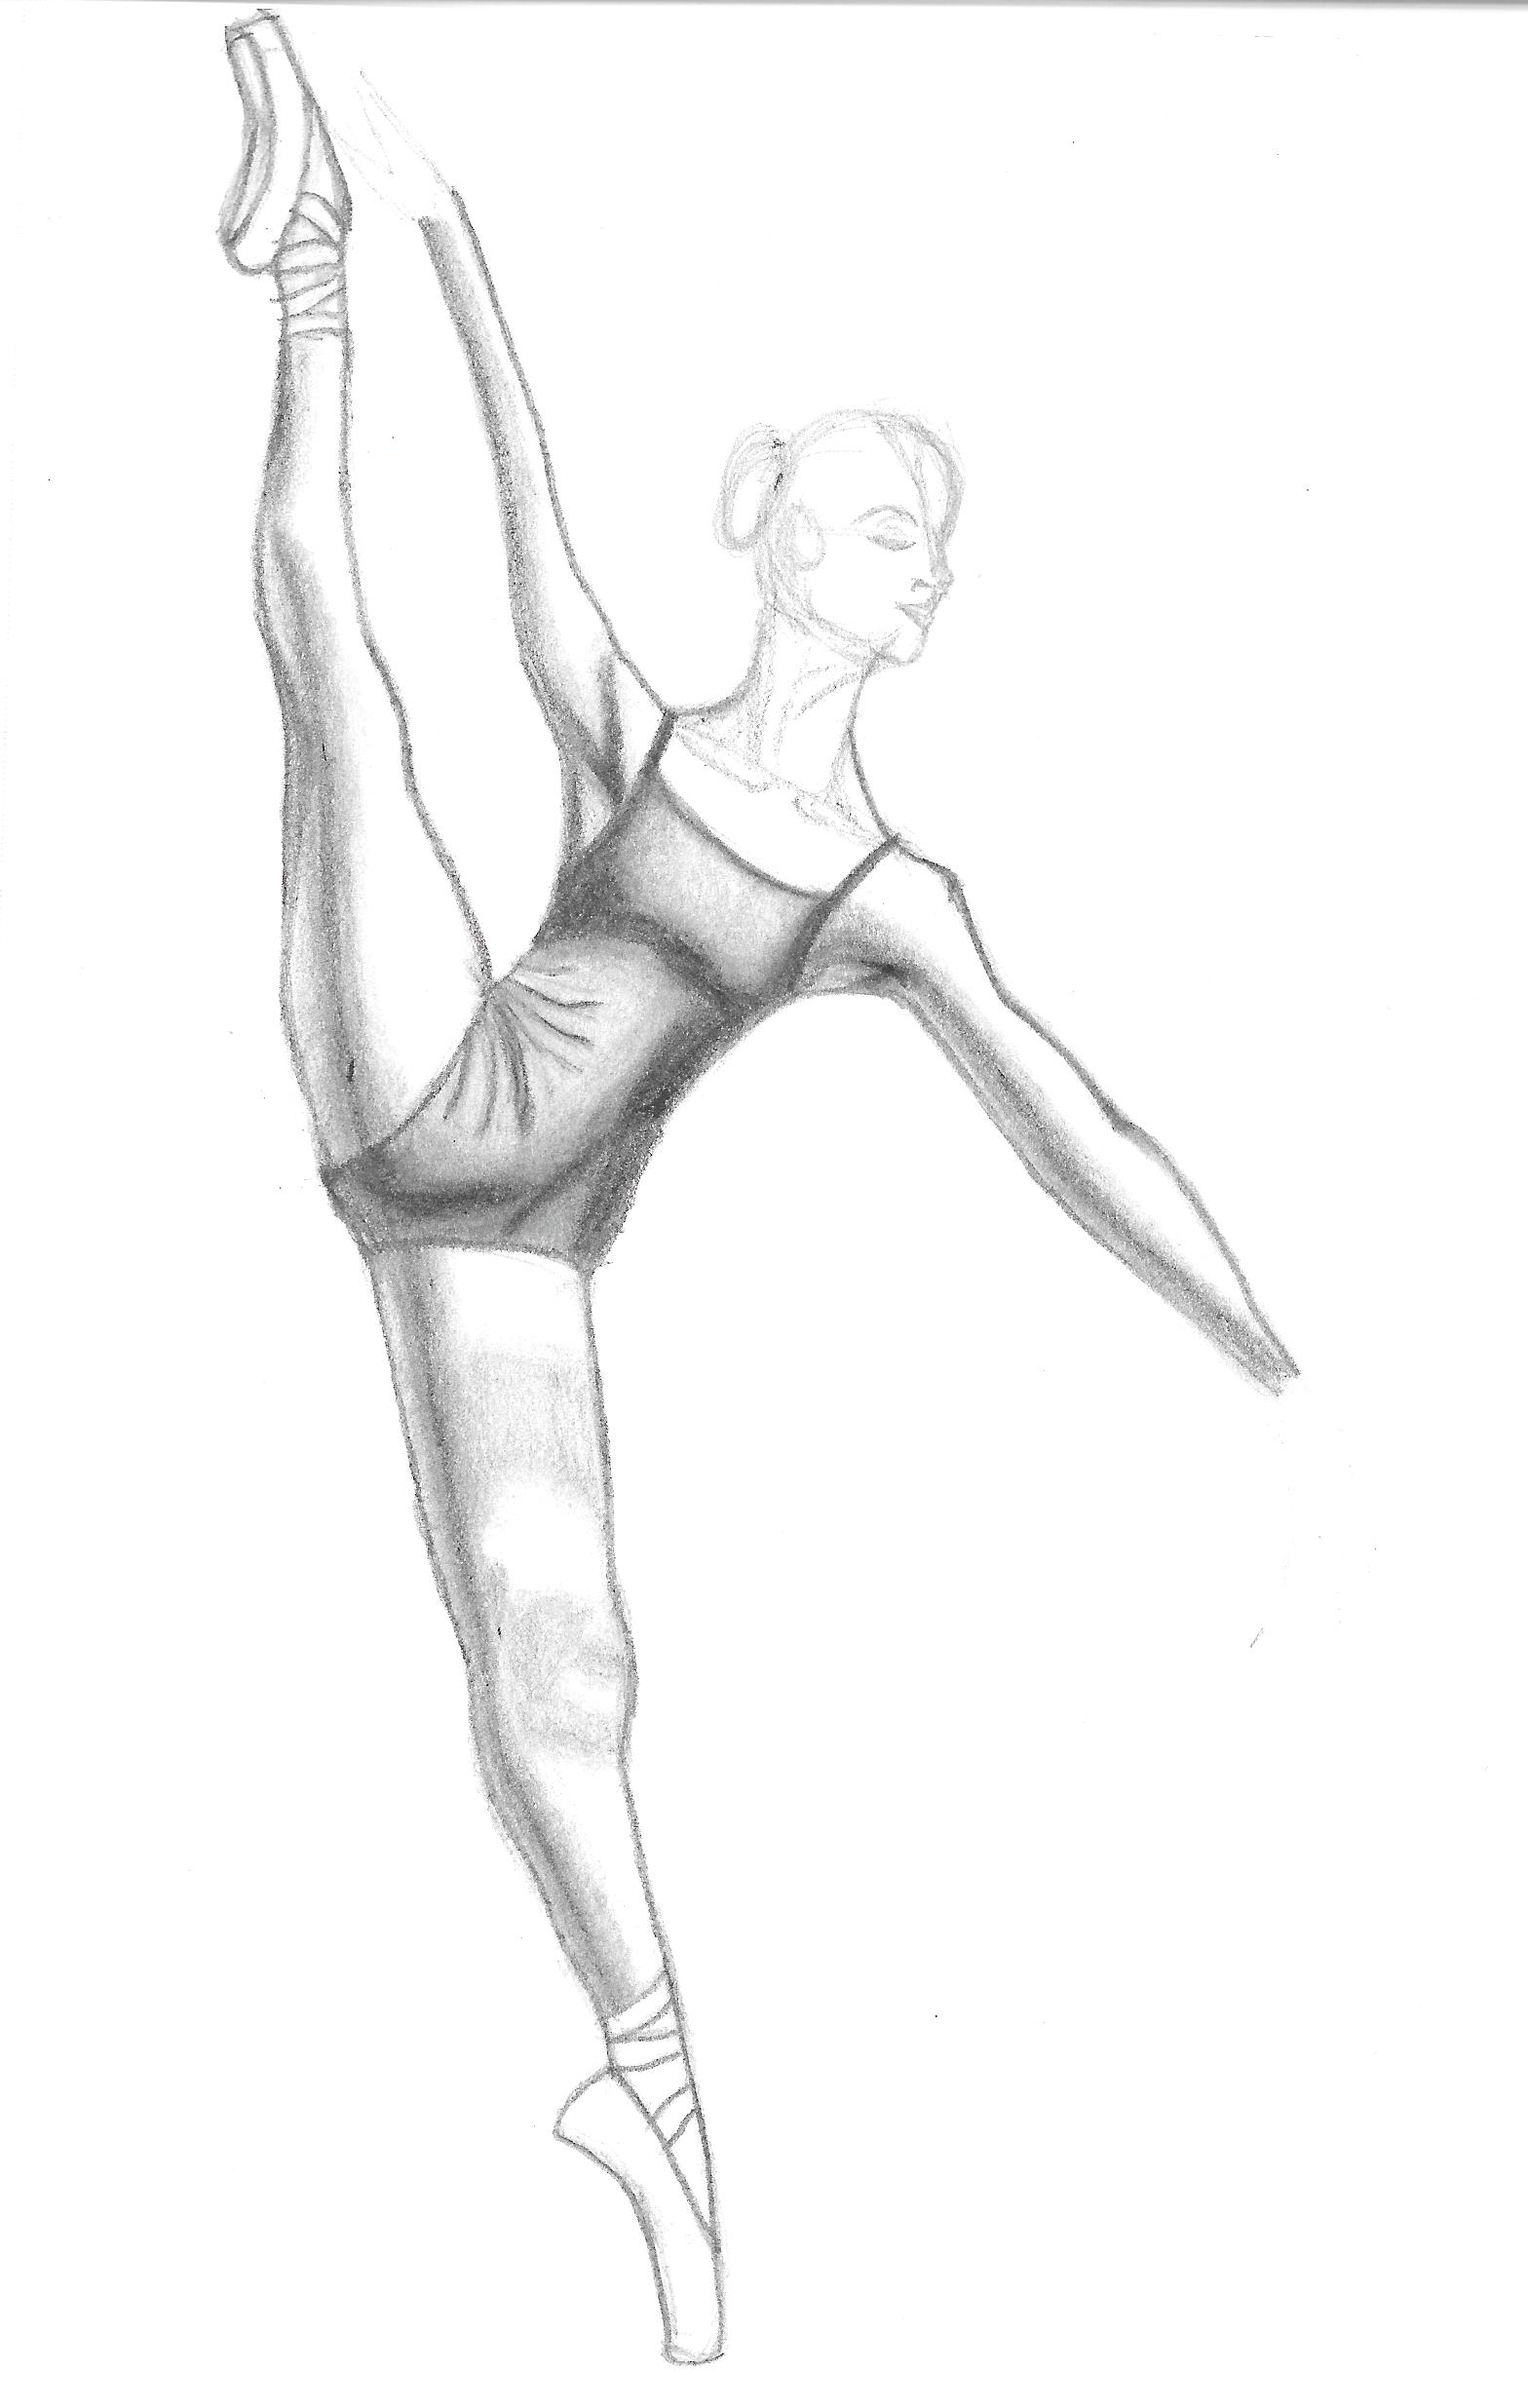 Uncategorized Drawing Of Ballerina ballerina drawing practice by duckydoesart on deviantart duckydoesart